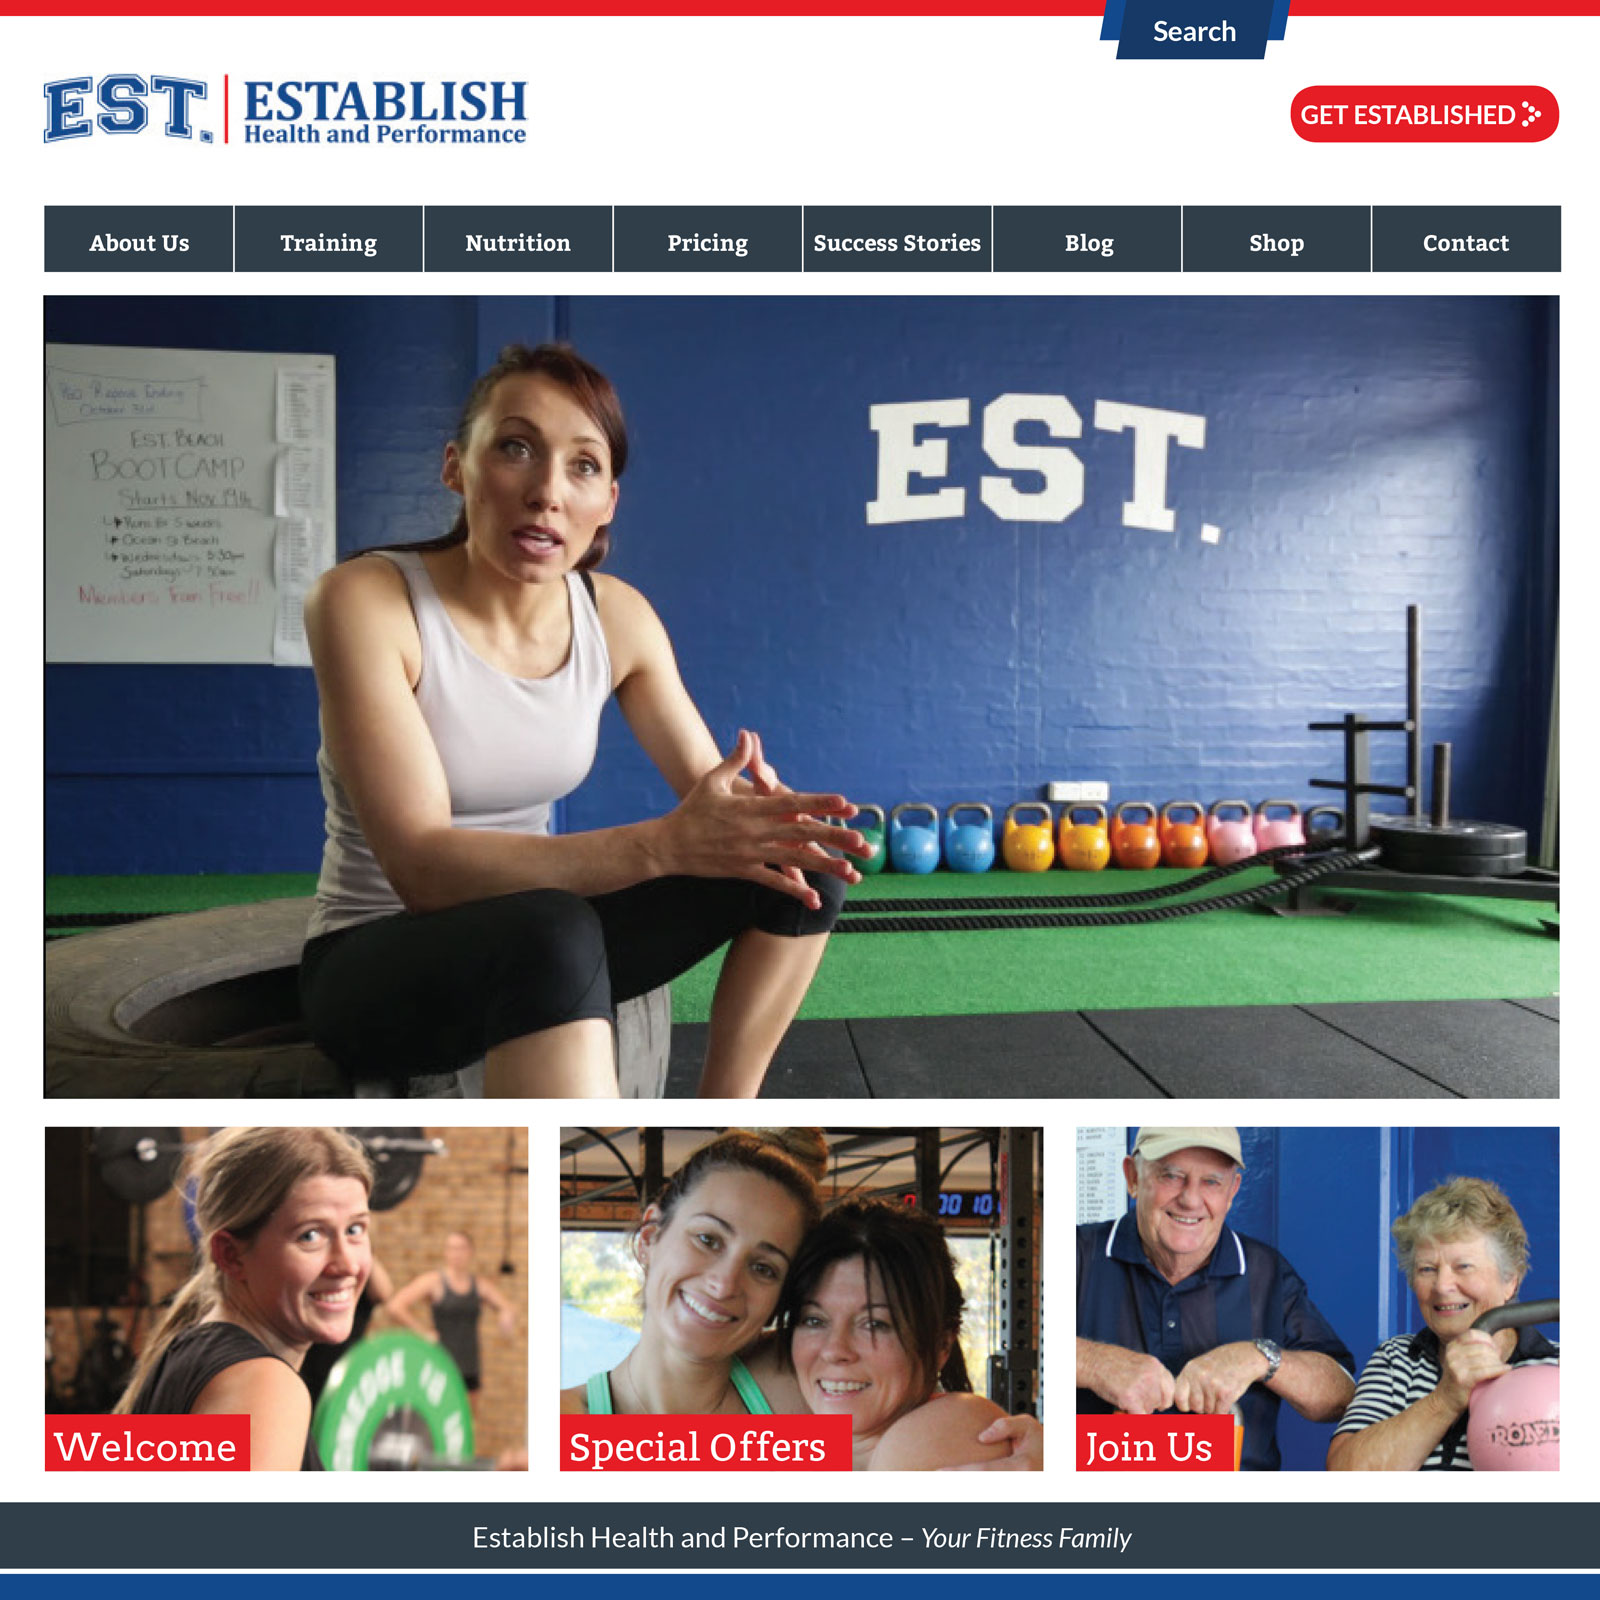 EST. Establish Health and Performance